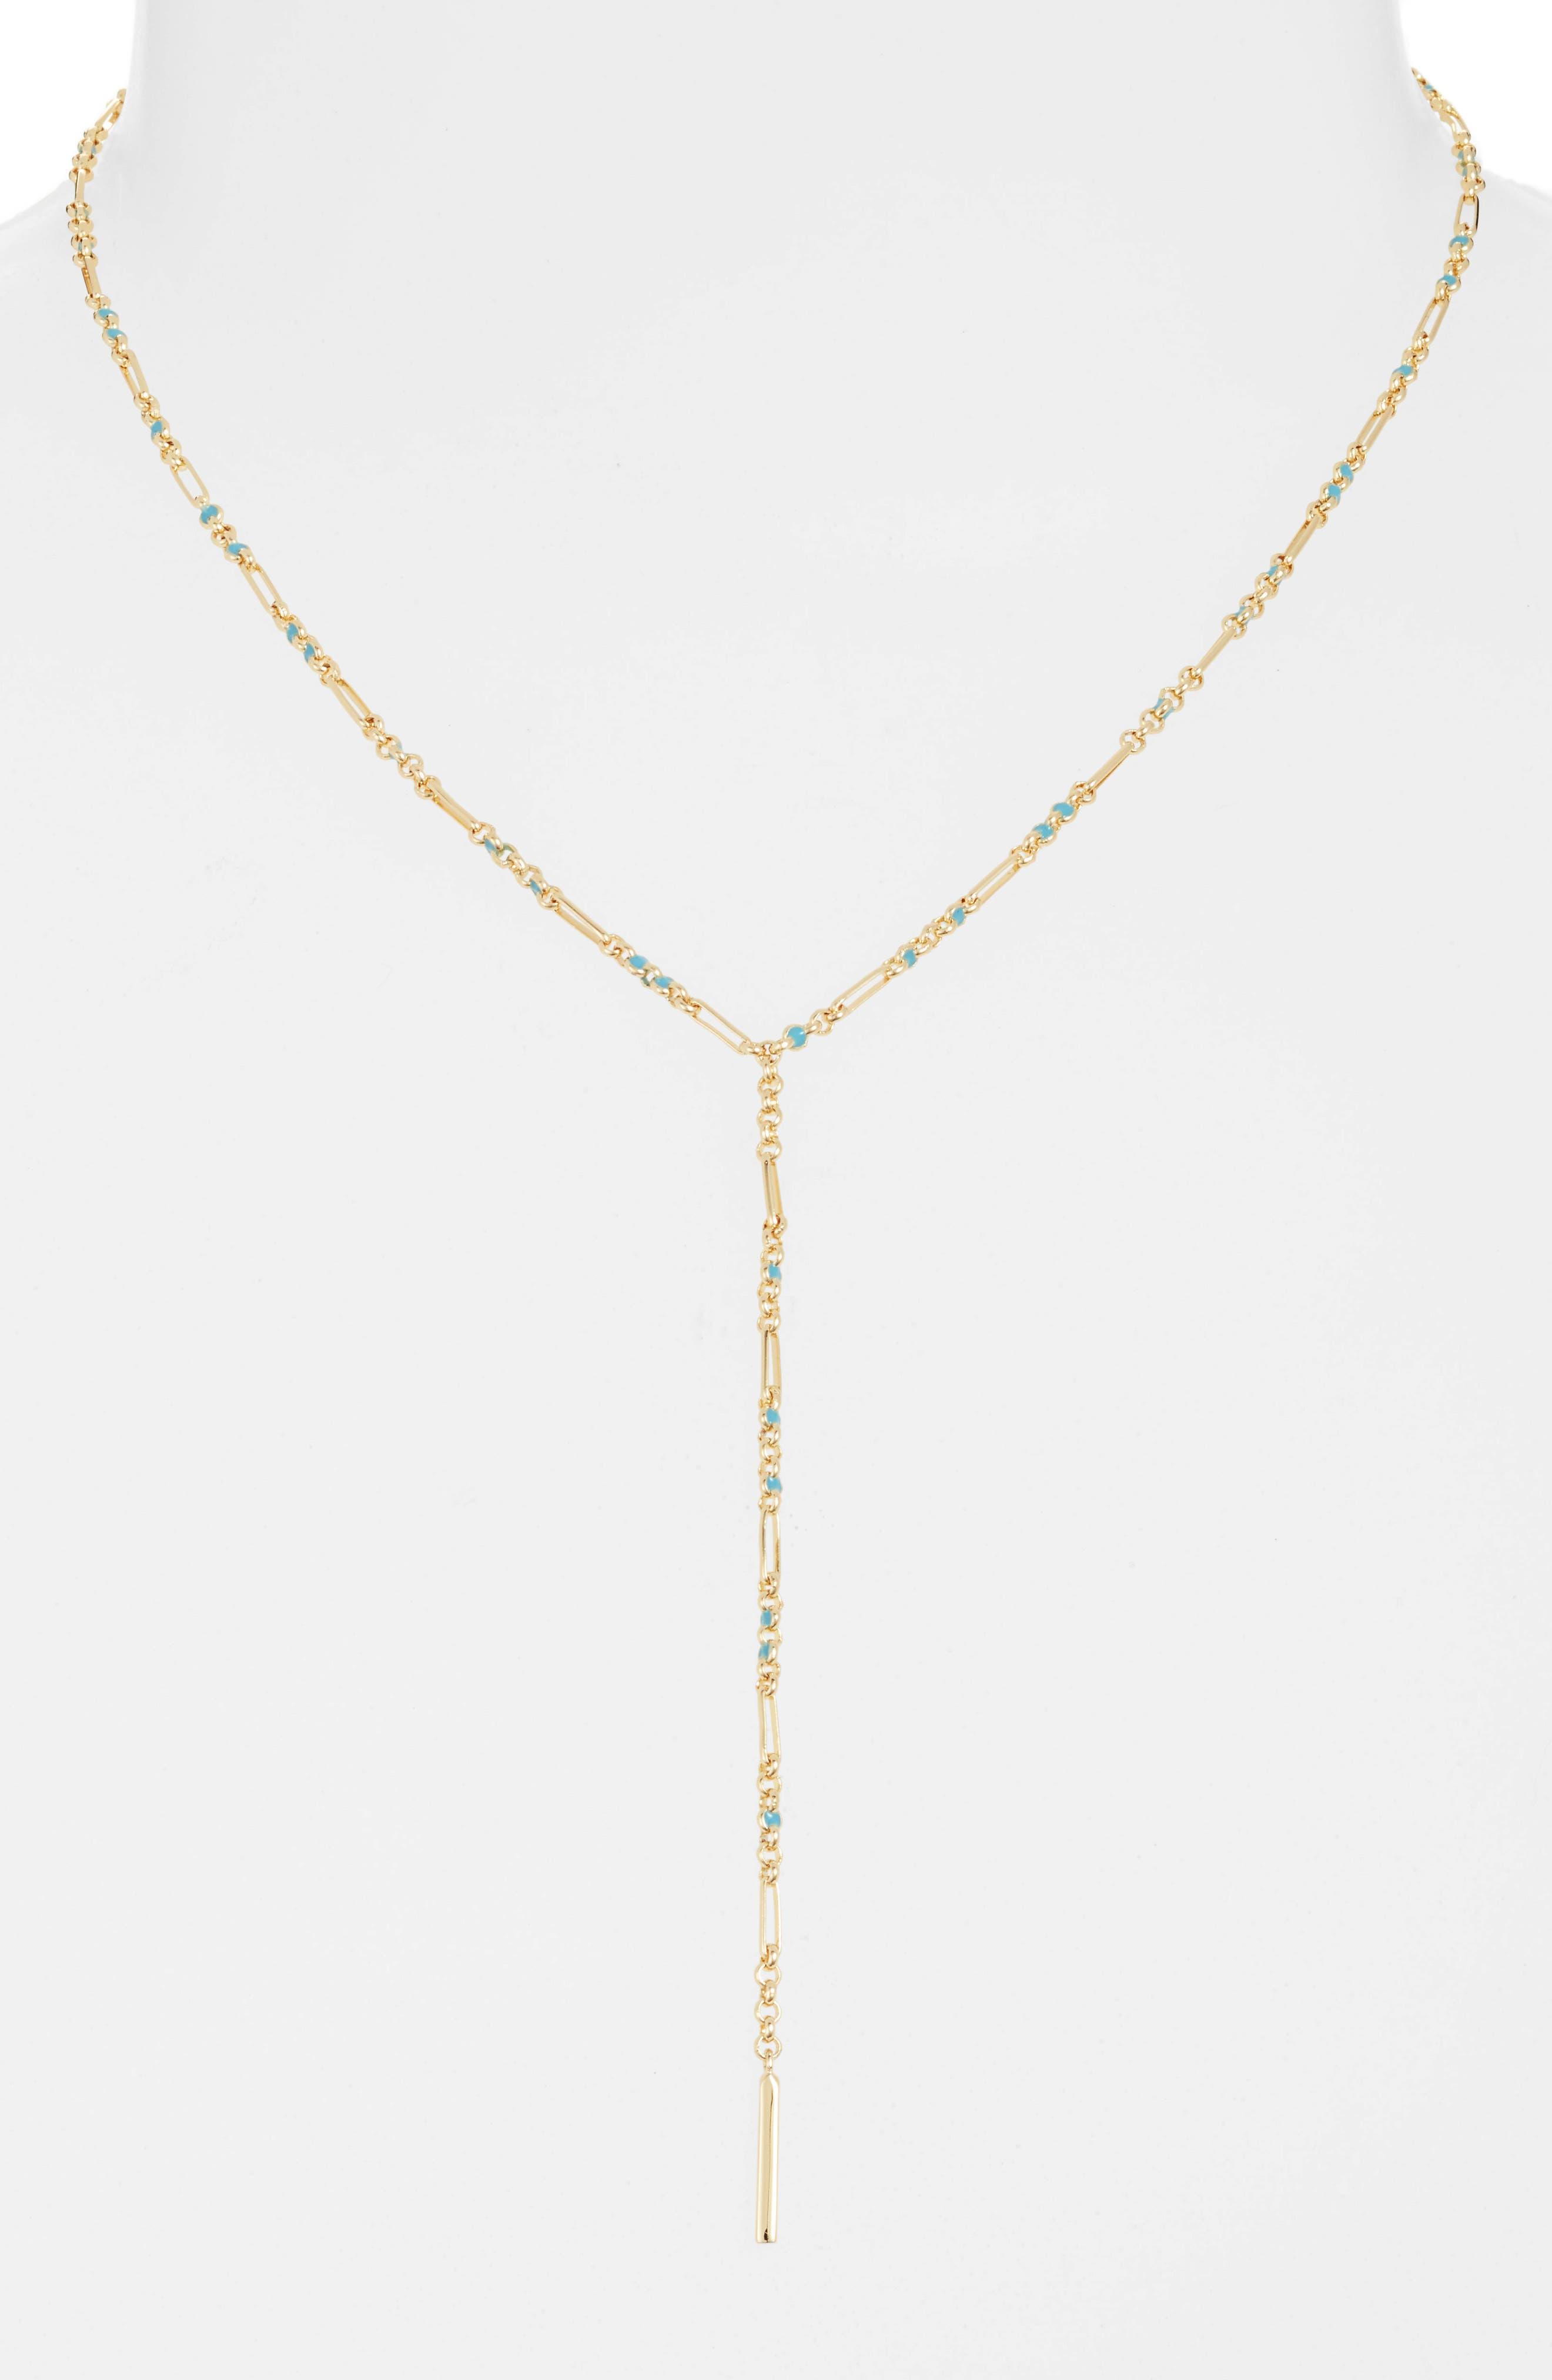 Gorjana Amalfi Y-Necklace